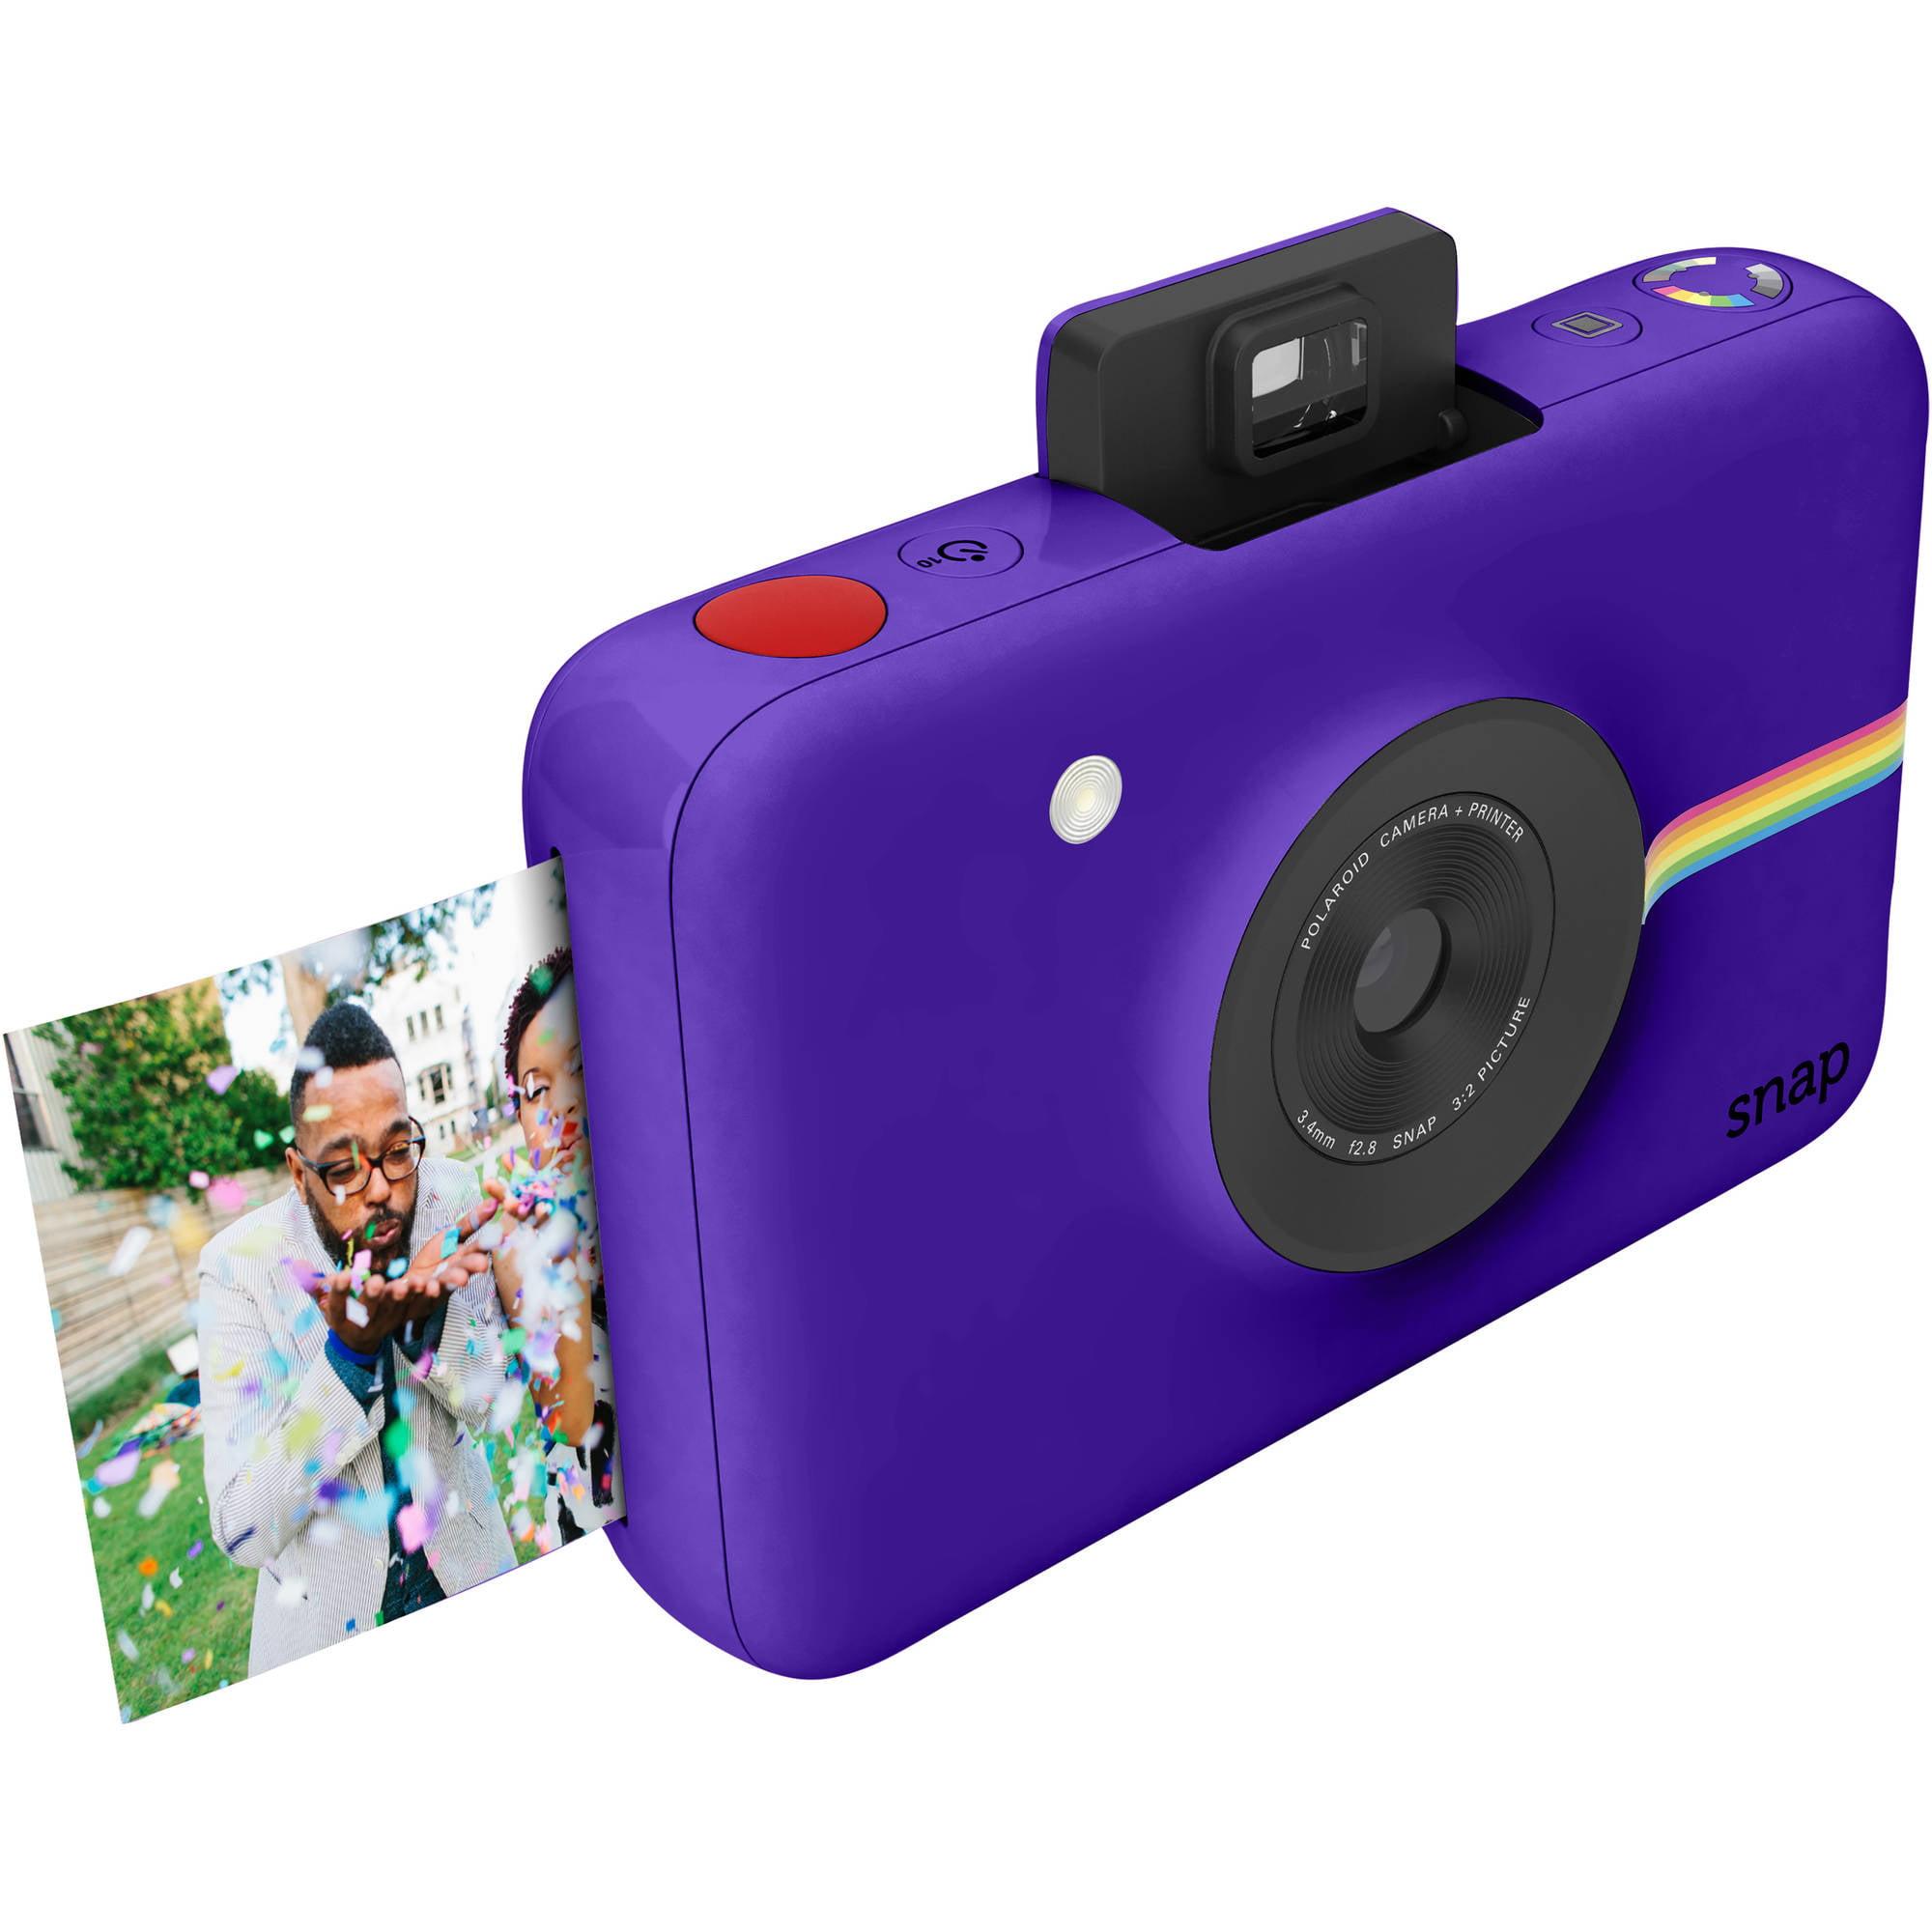 polaroid purple snap instant digital camera with 10